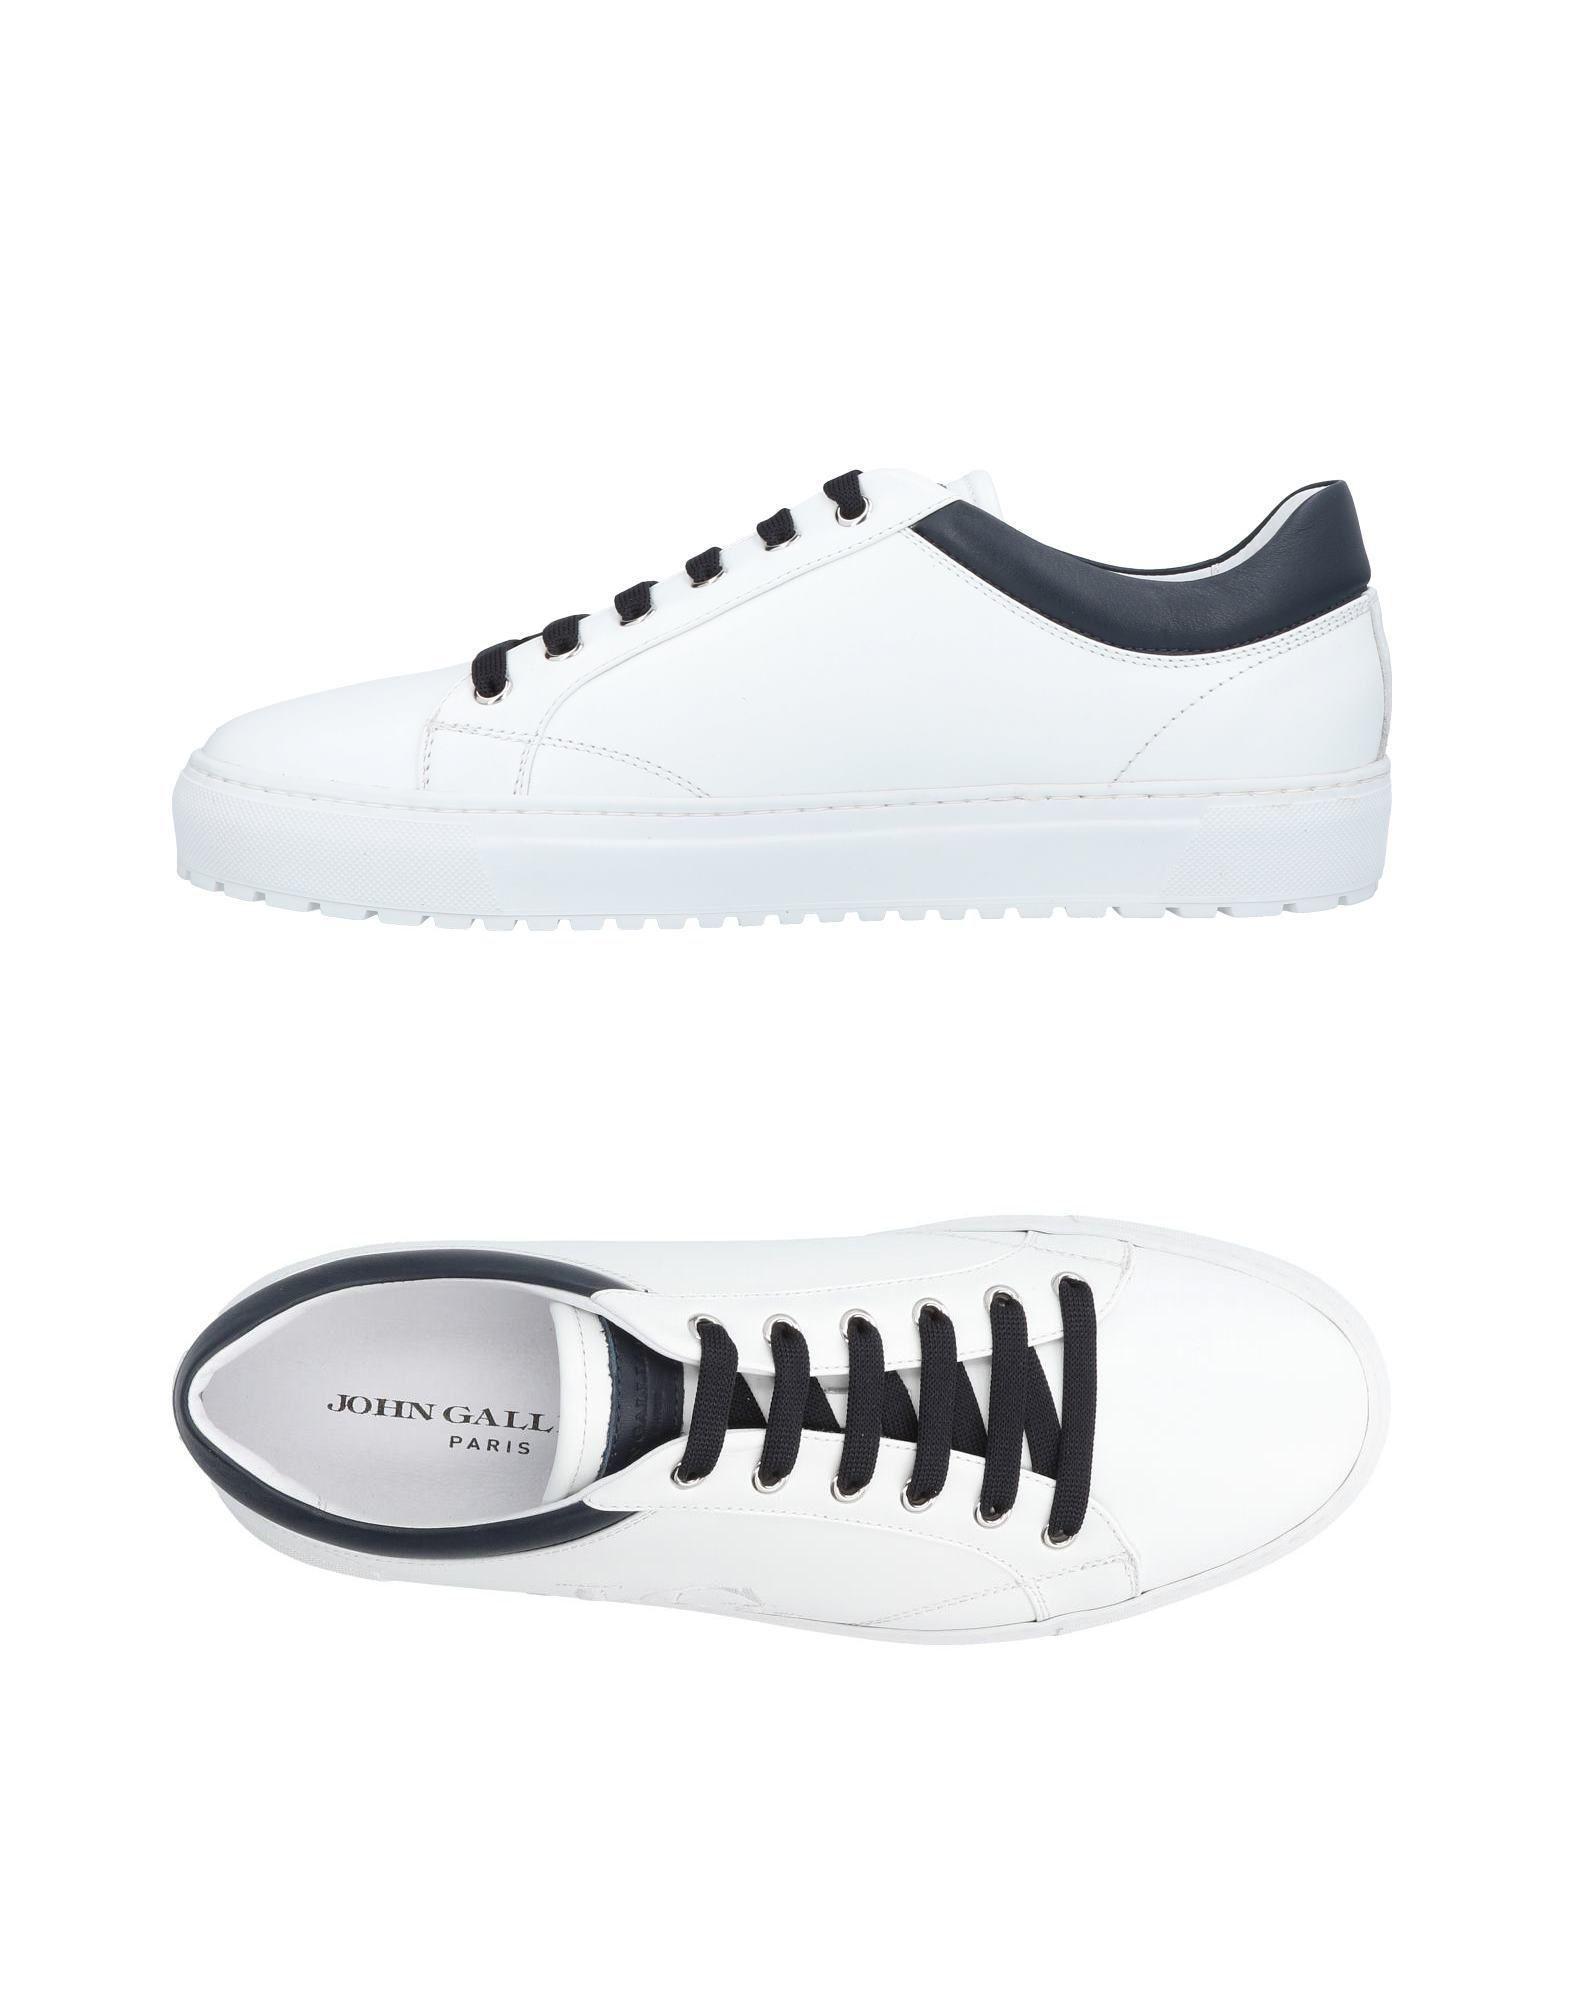 FOOTWEAR - Low-tops & sneakers John Galliano Cheap Sale Nicekicks Many Colors Cheap Sale Manchester Marketable Cheap Online u0QjphHKV